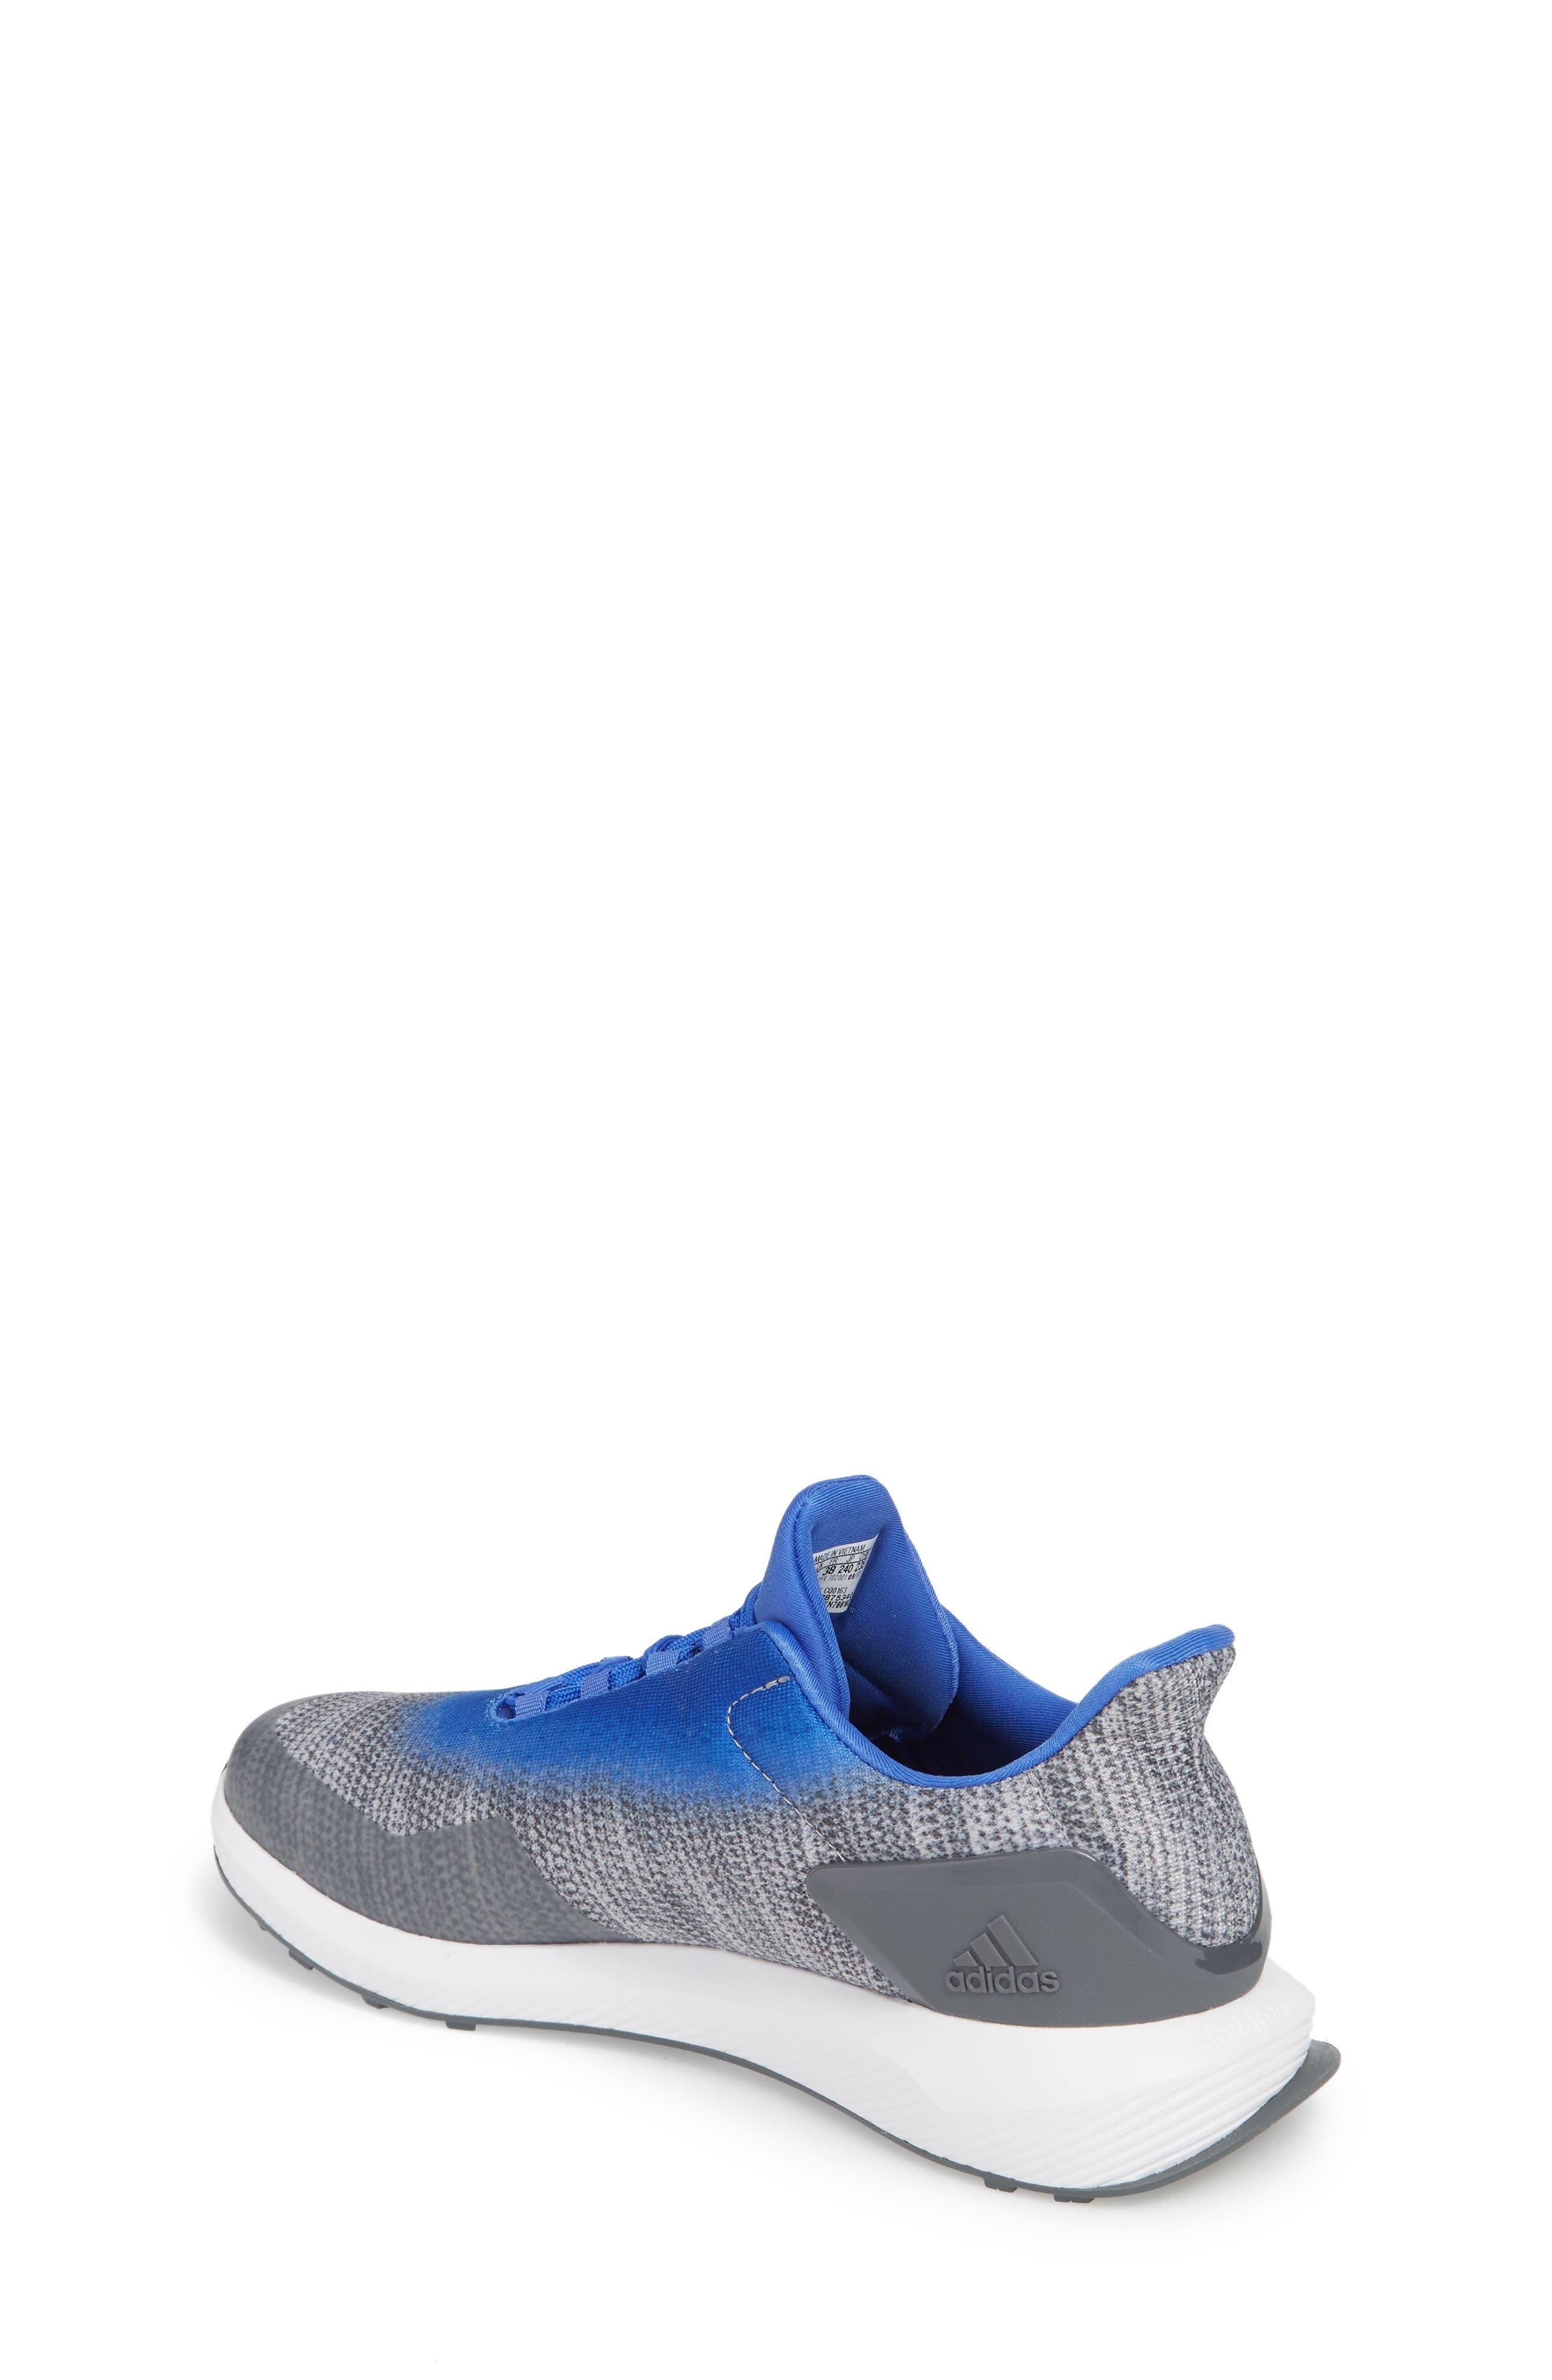 RapidaRun Uncaged Sneaker,                             Alternate thumbnail 2, color,                             Grey / Grey / Blue